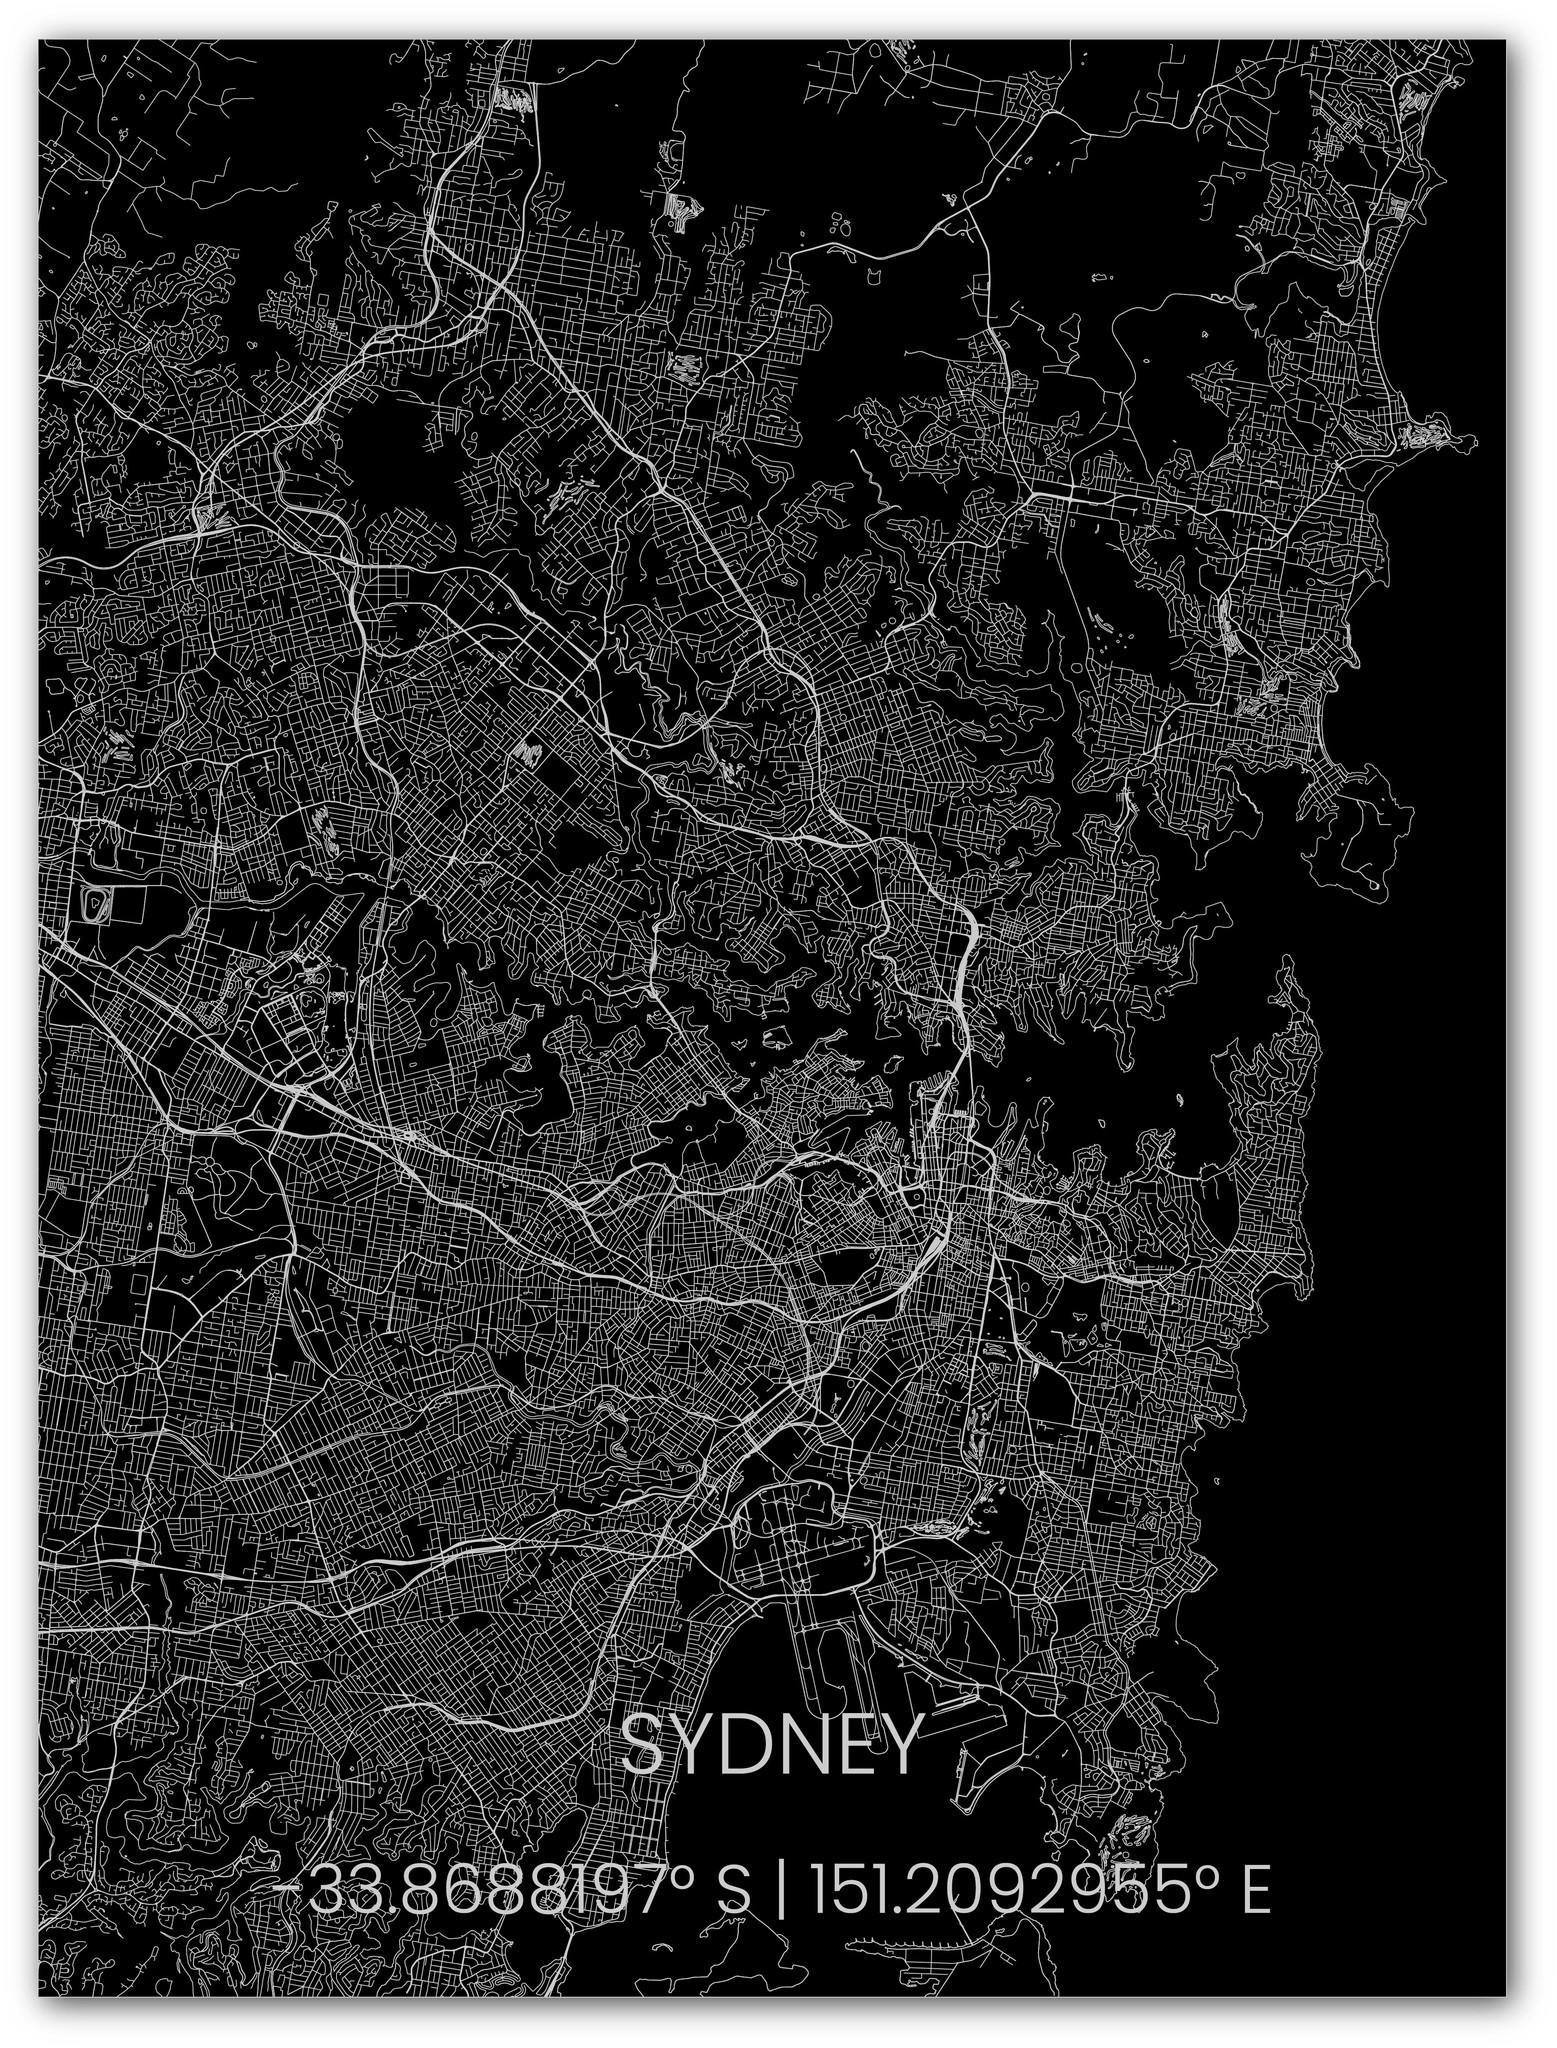 Metalen stadsplattegrond Sydney-1